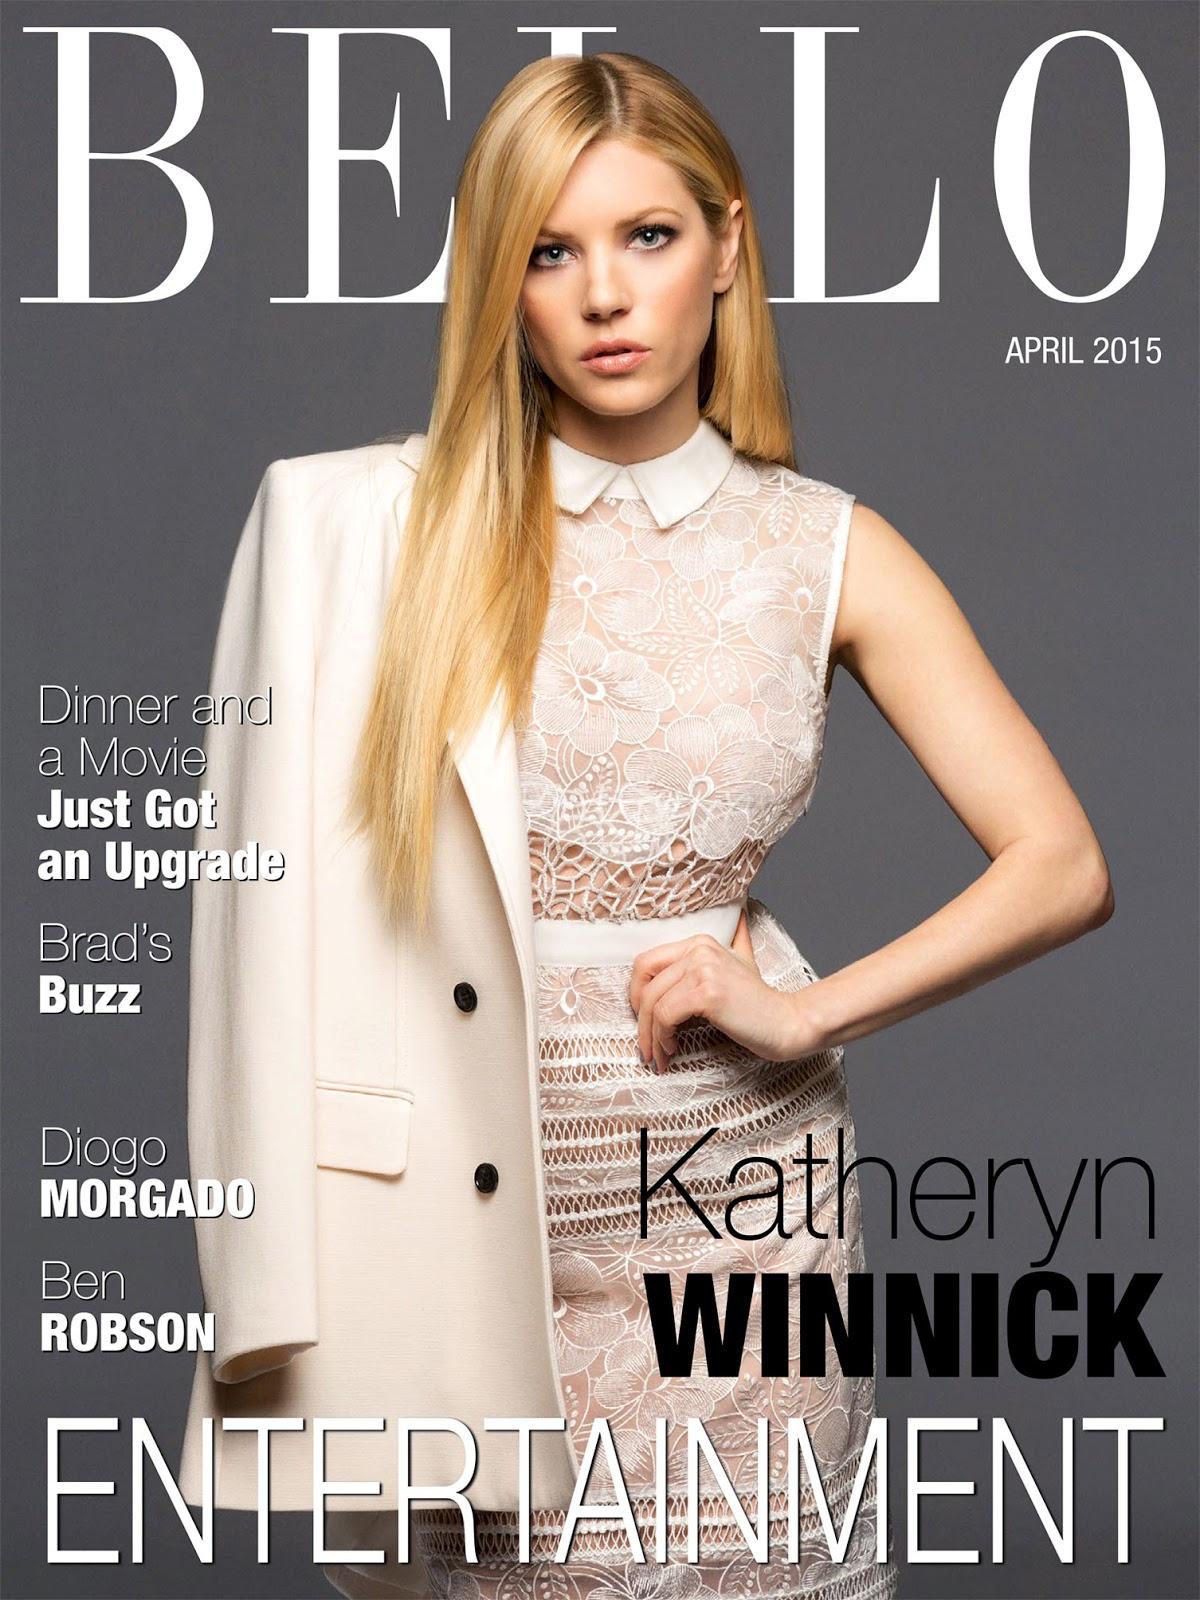 Actress @ Katheryn Winnick - Bello Magazine, April 2015